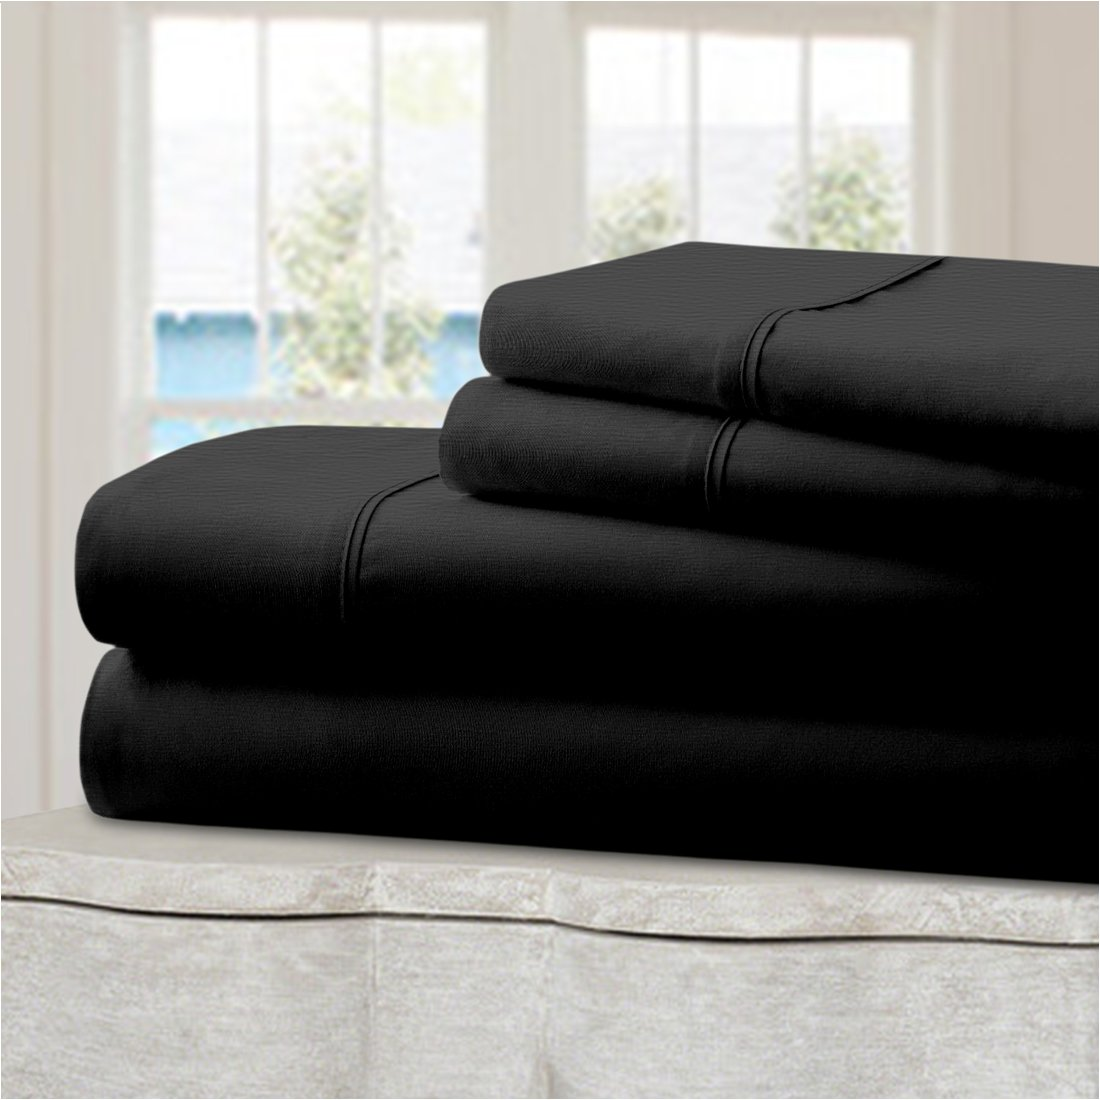 Mellanni 100% Cotton Bed Sheet Set King Black